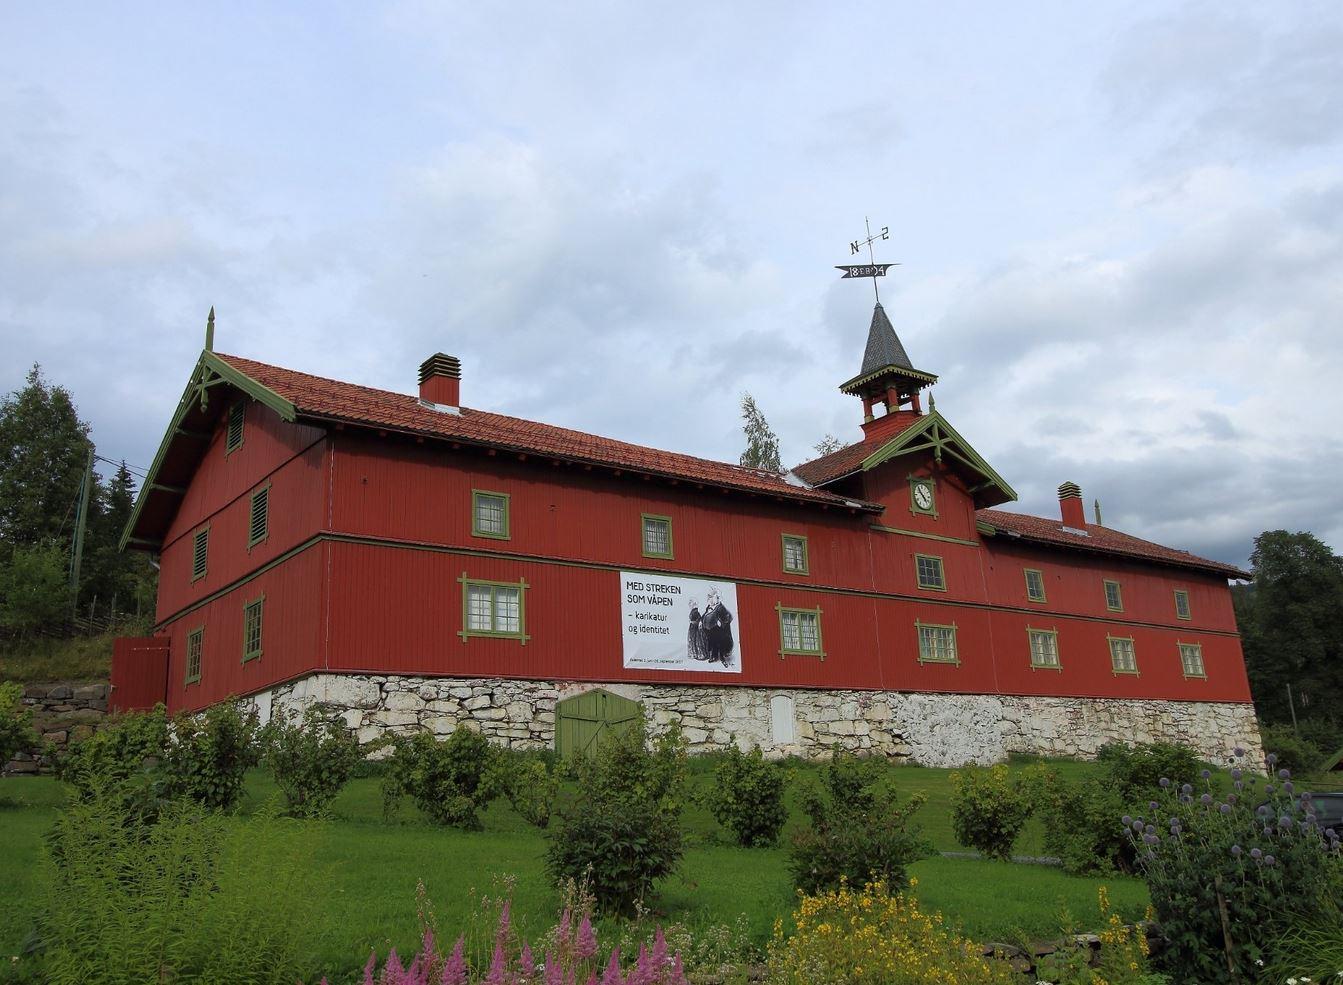 Aulestad in Gausdal